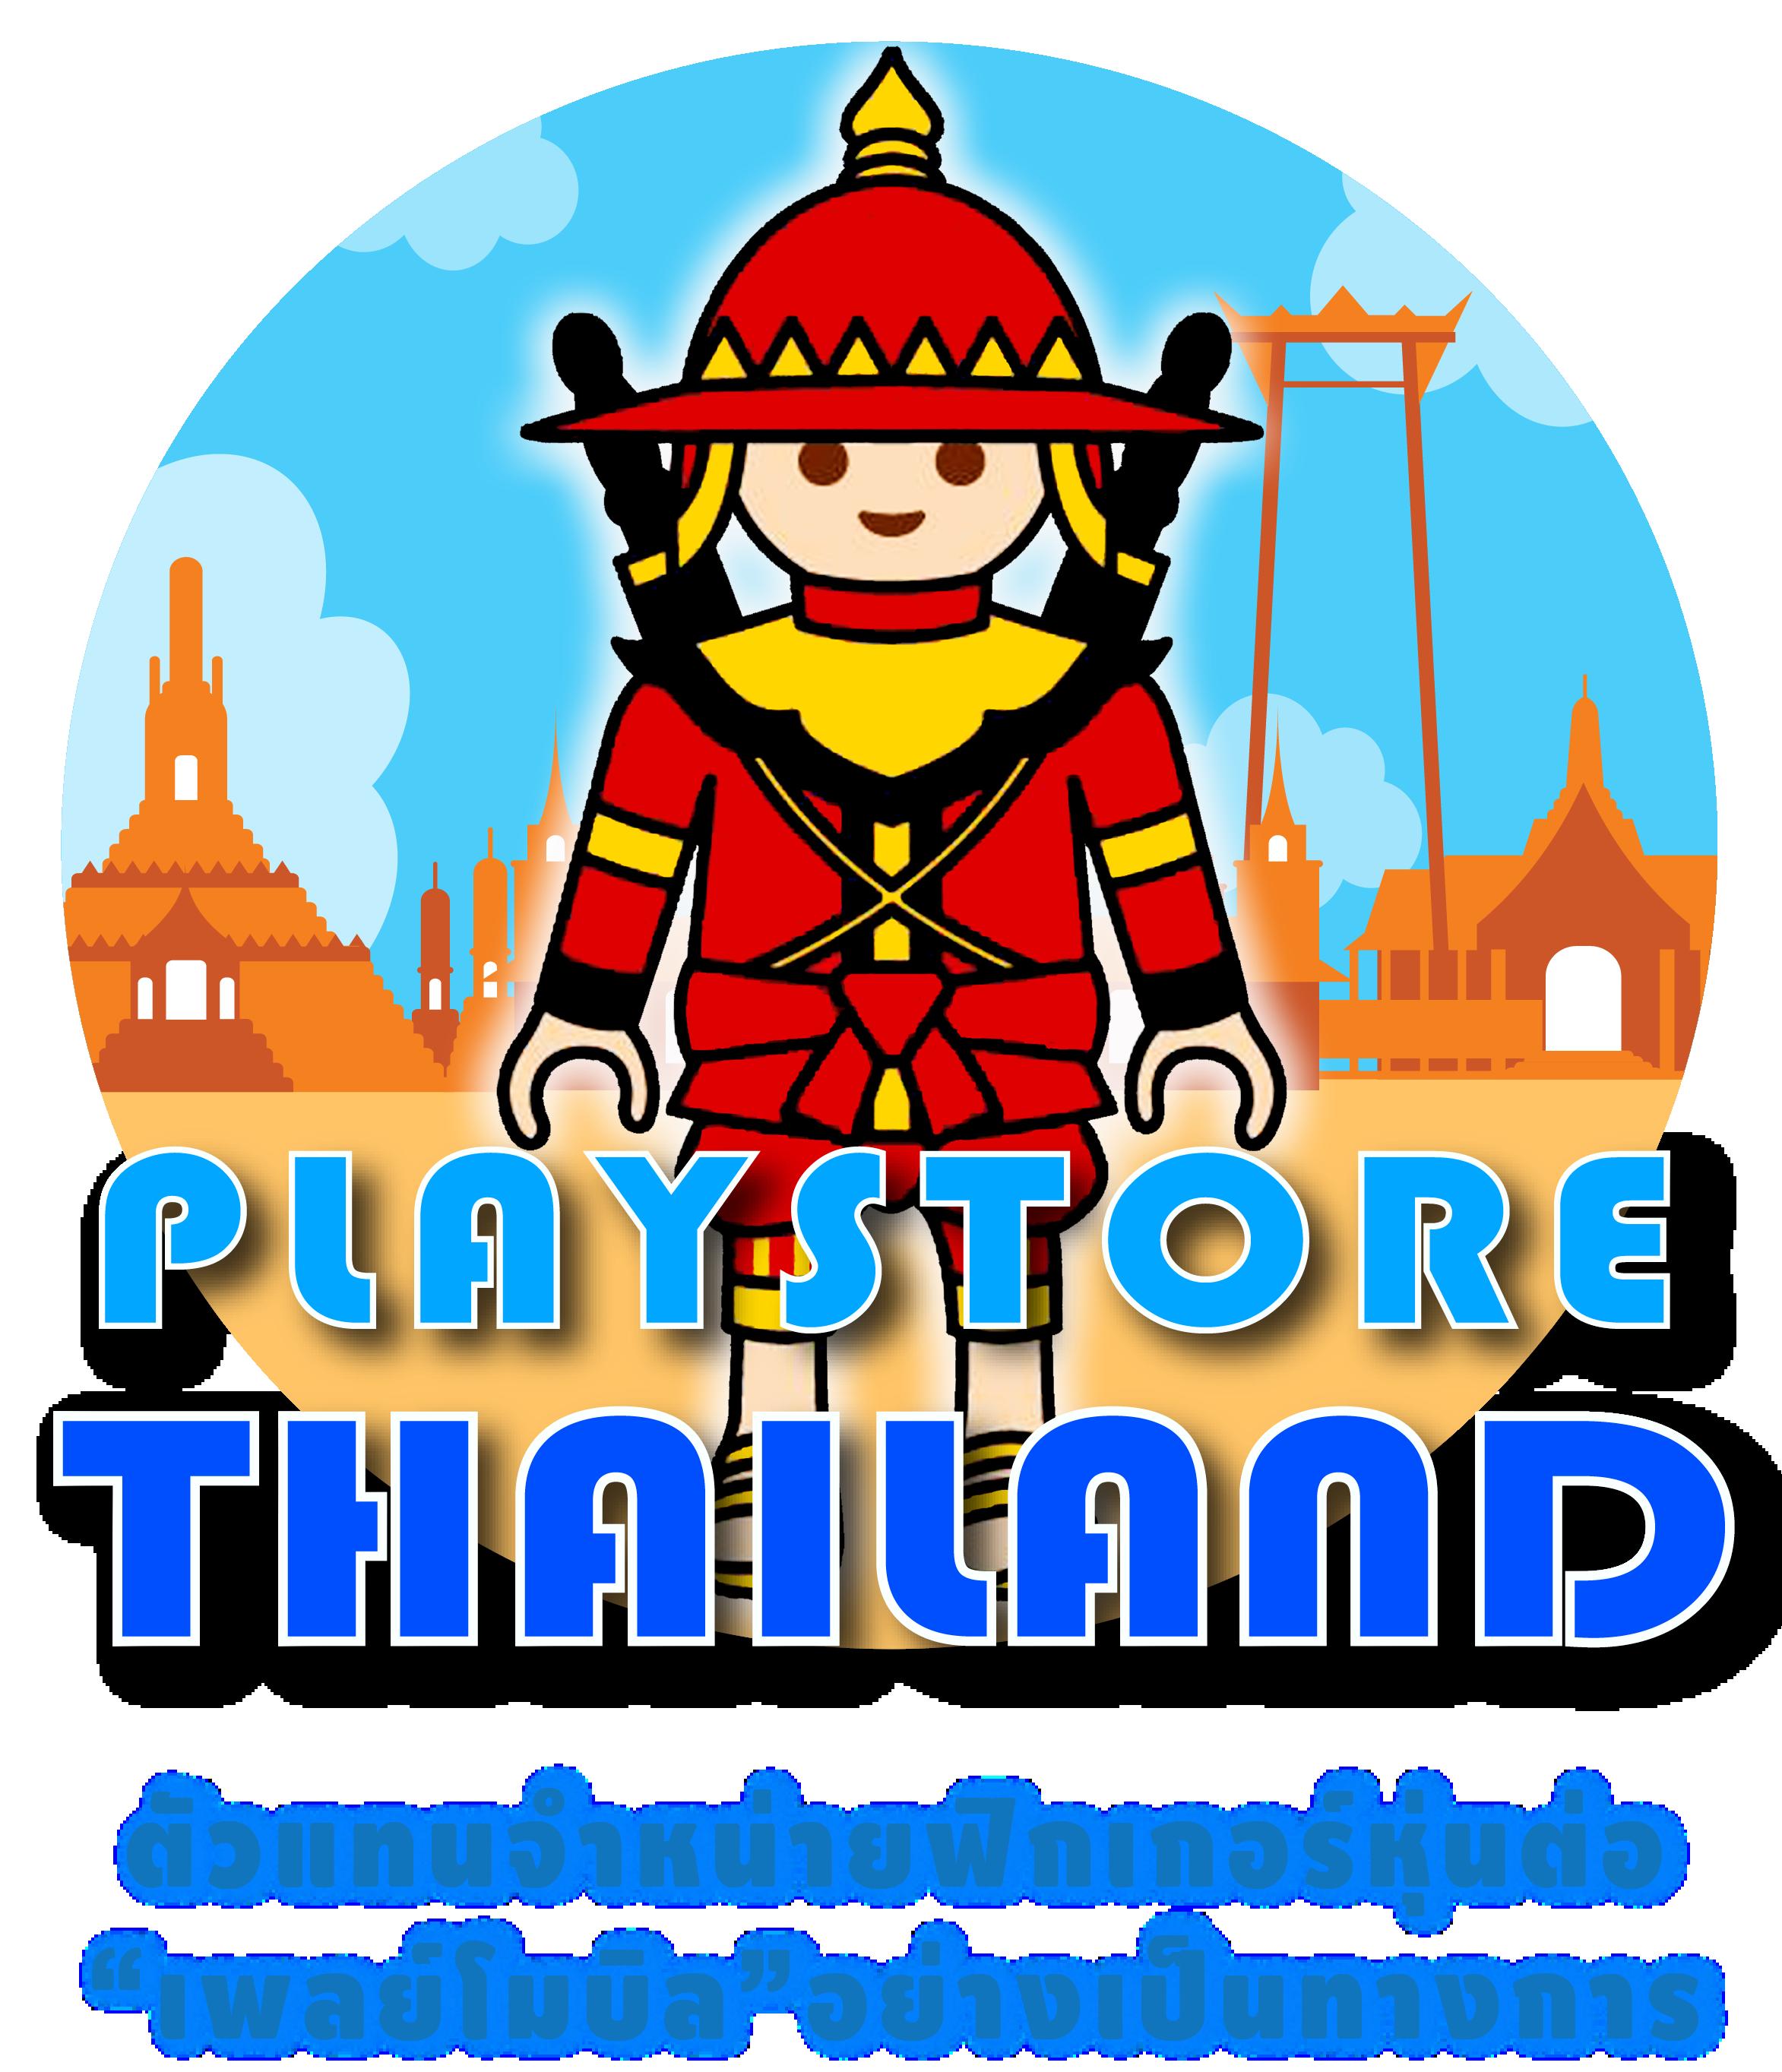 http://www.playstorethailand.com/